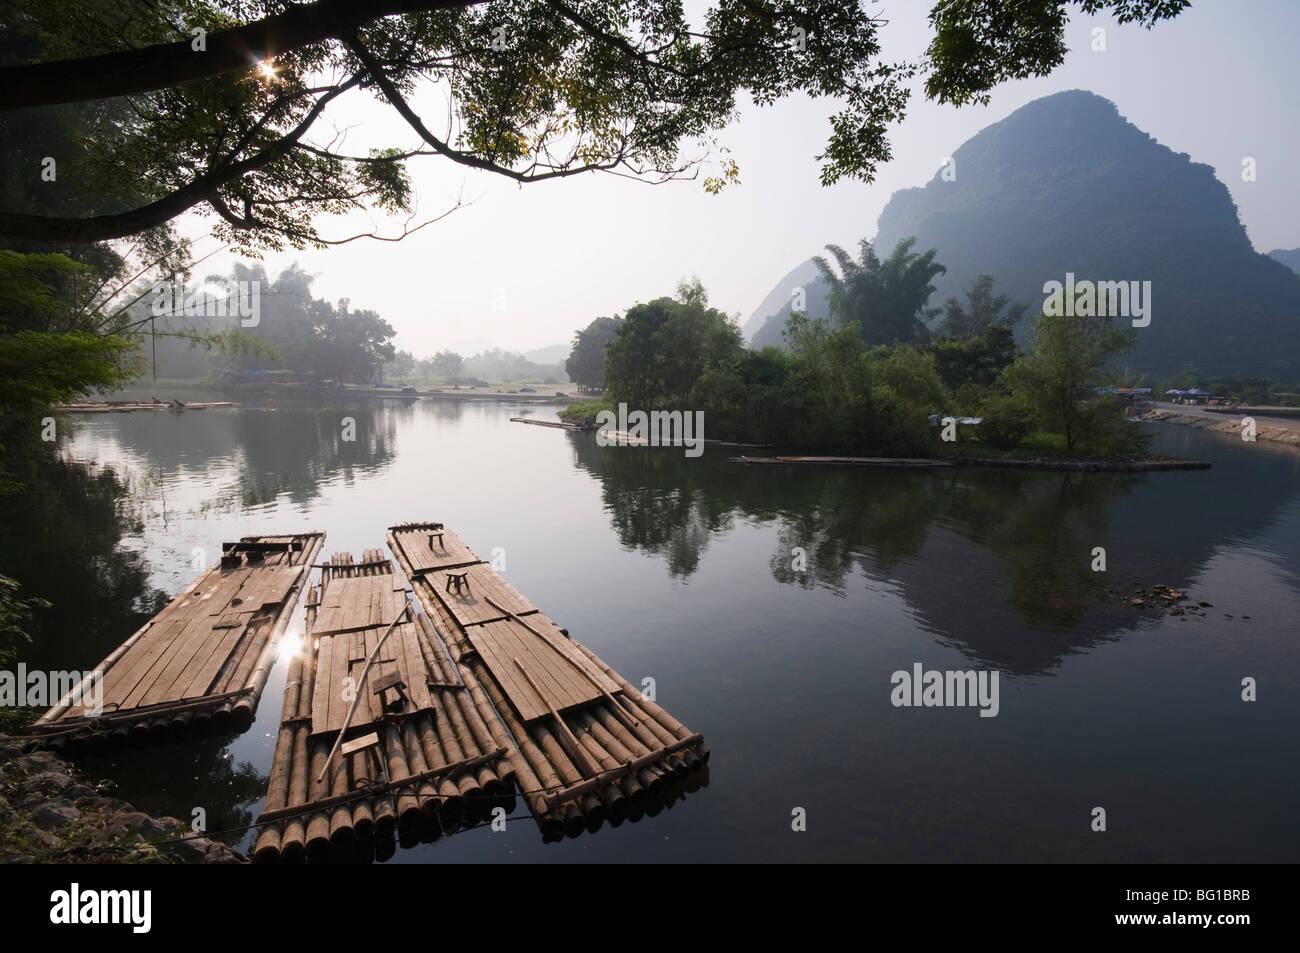 Karst limestone scenery on the Li river (Lijiang) in Yangshuo, near Guilin, Guangxi Province, China, Asia Stock Photo